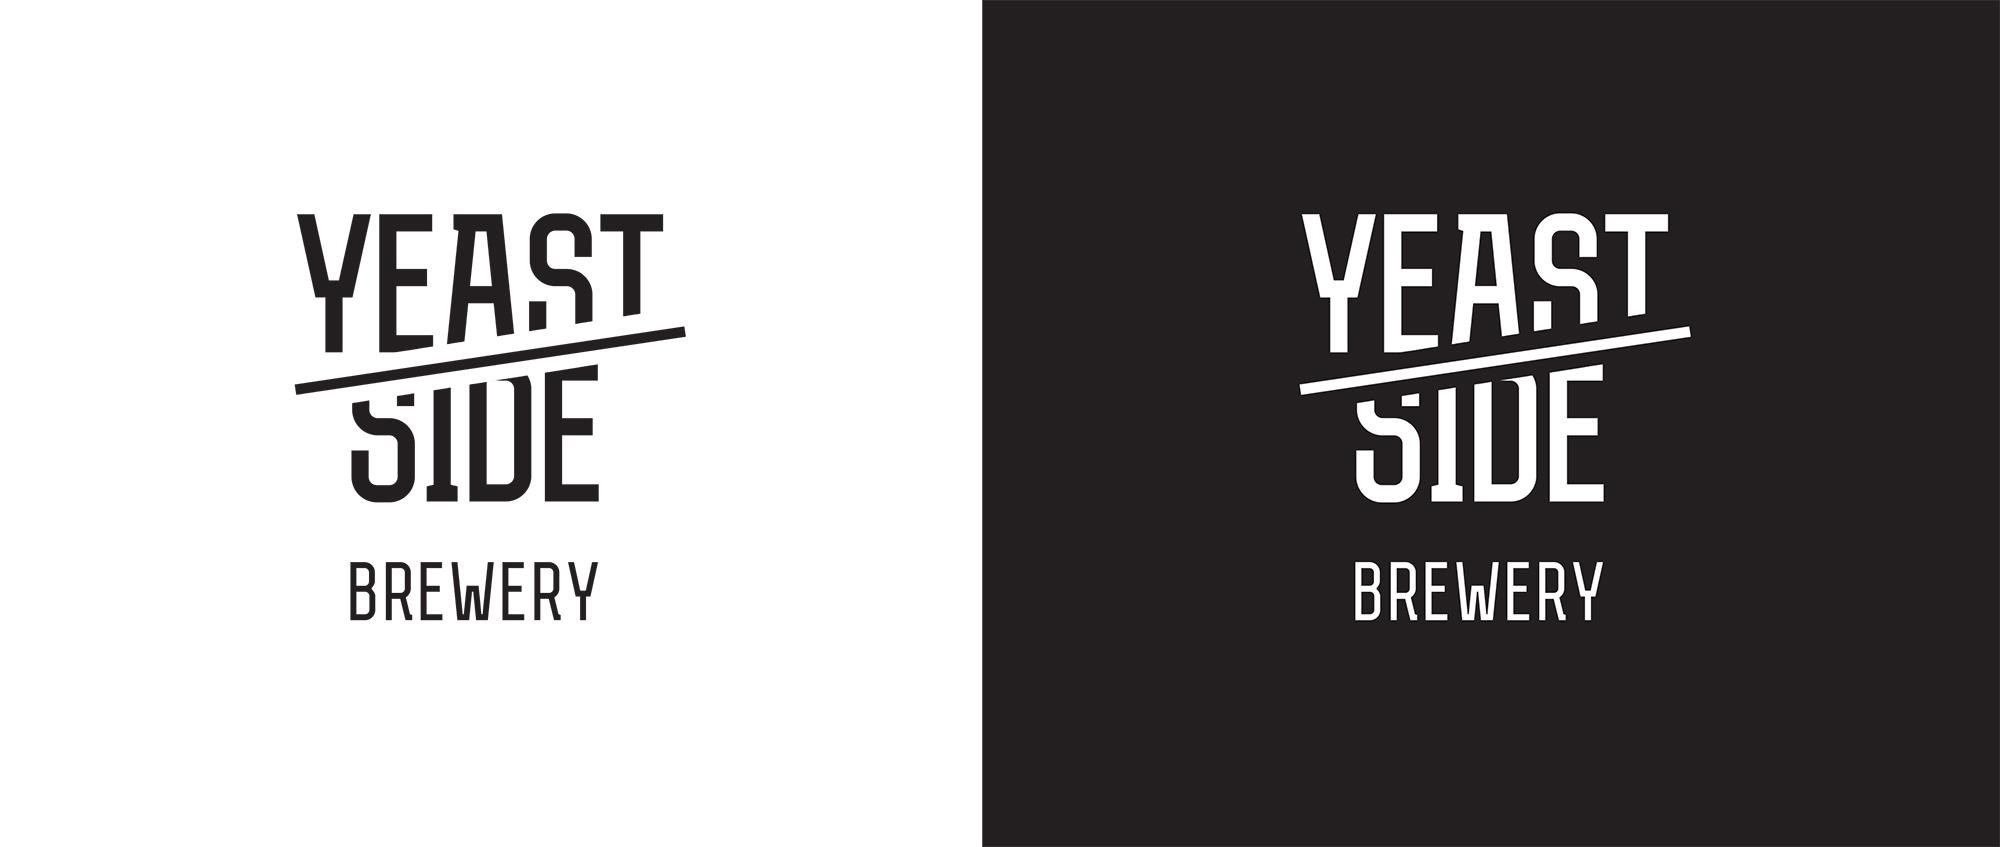 Yeast_Side_Prezentacio_170615